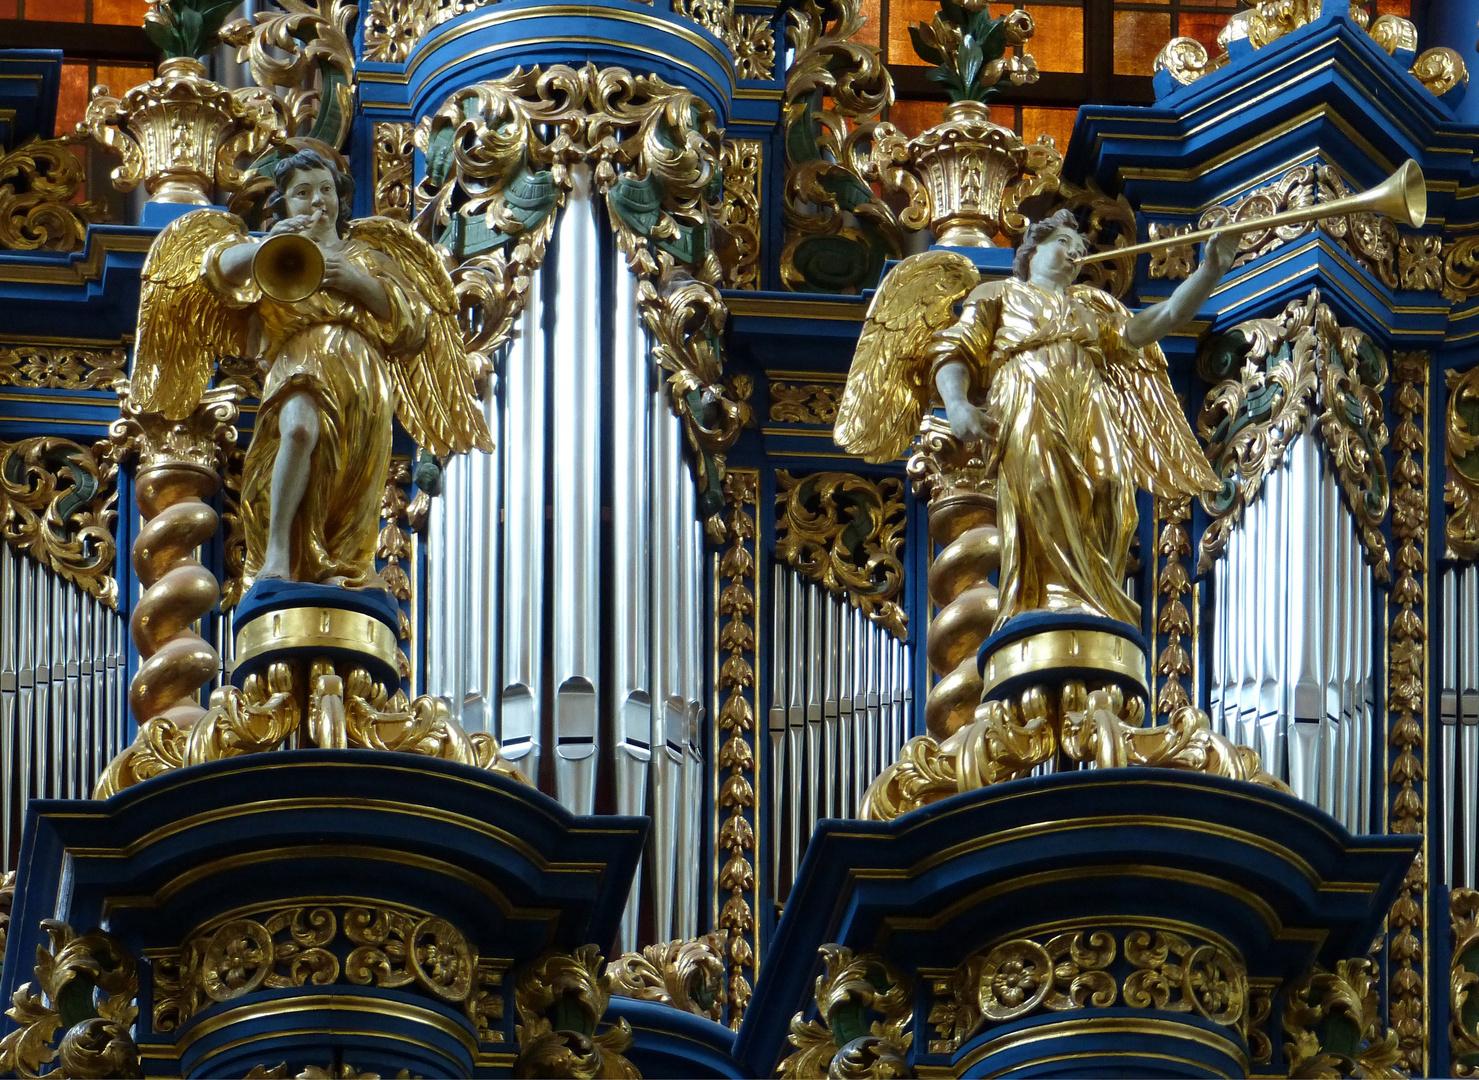 Barock-Orgel (1719 - 1721). Heiligelinde (Swieta Lipka), Polen 2015